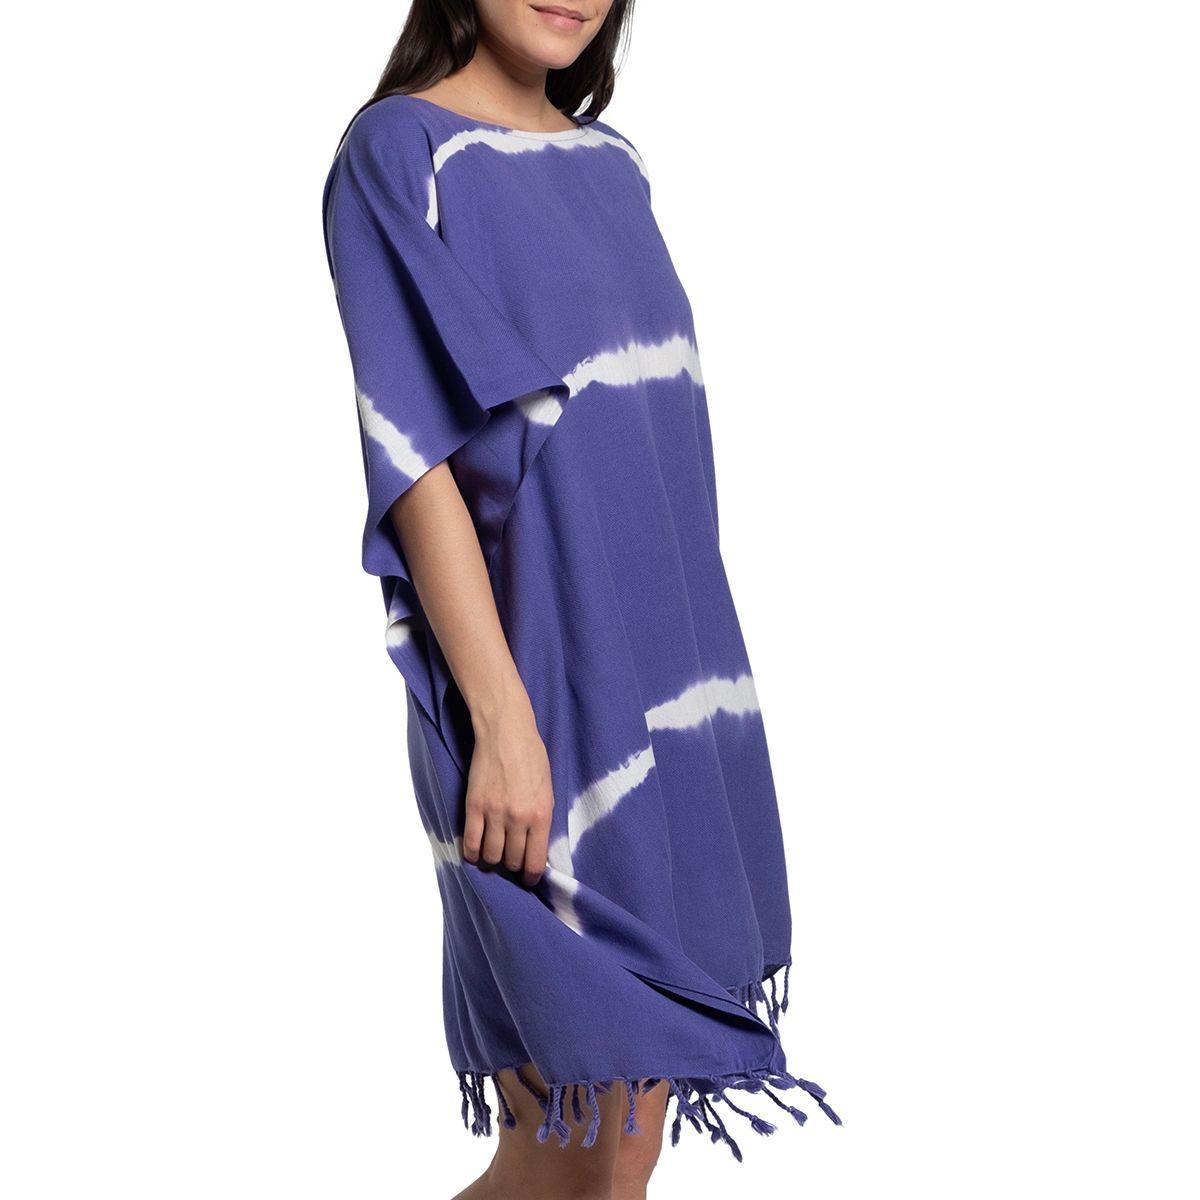 Tunic Daisy / Tie Dye - Base Violet